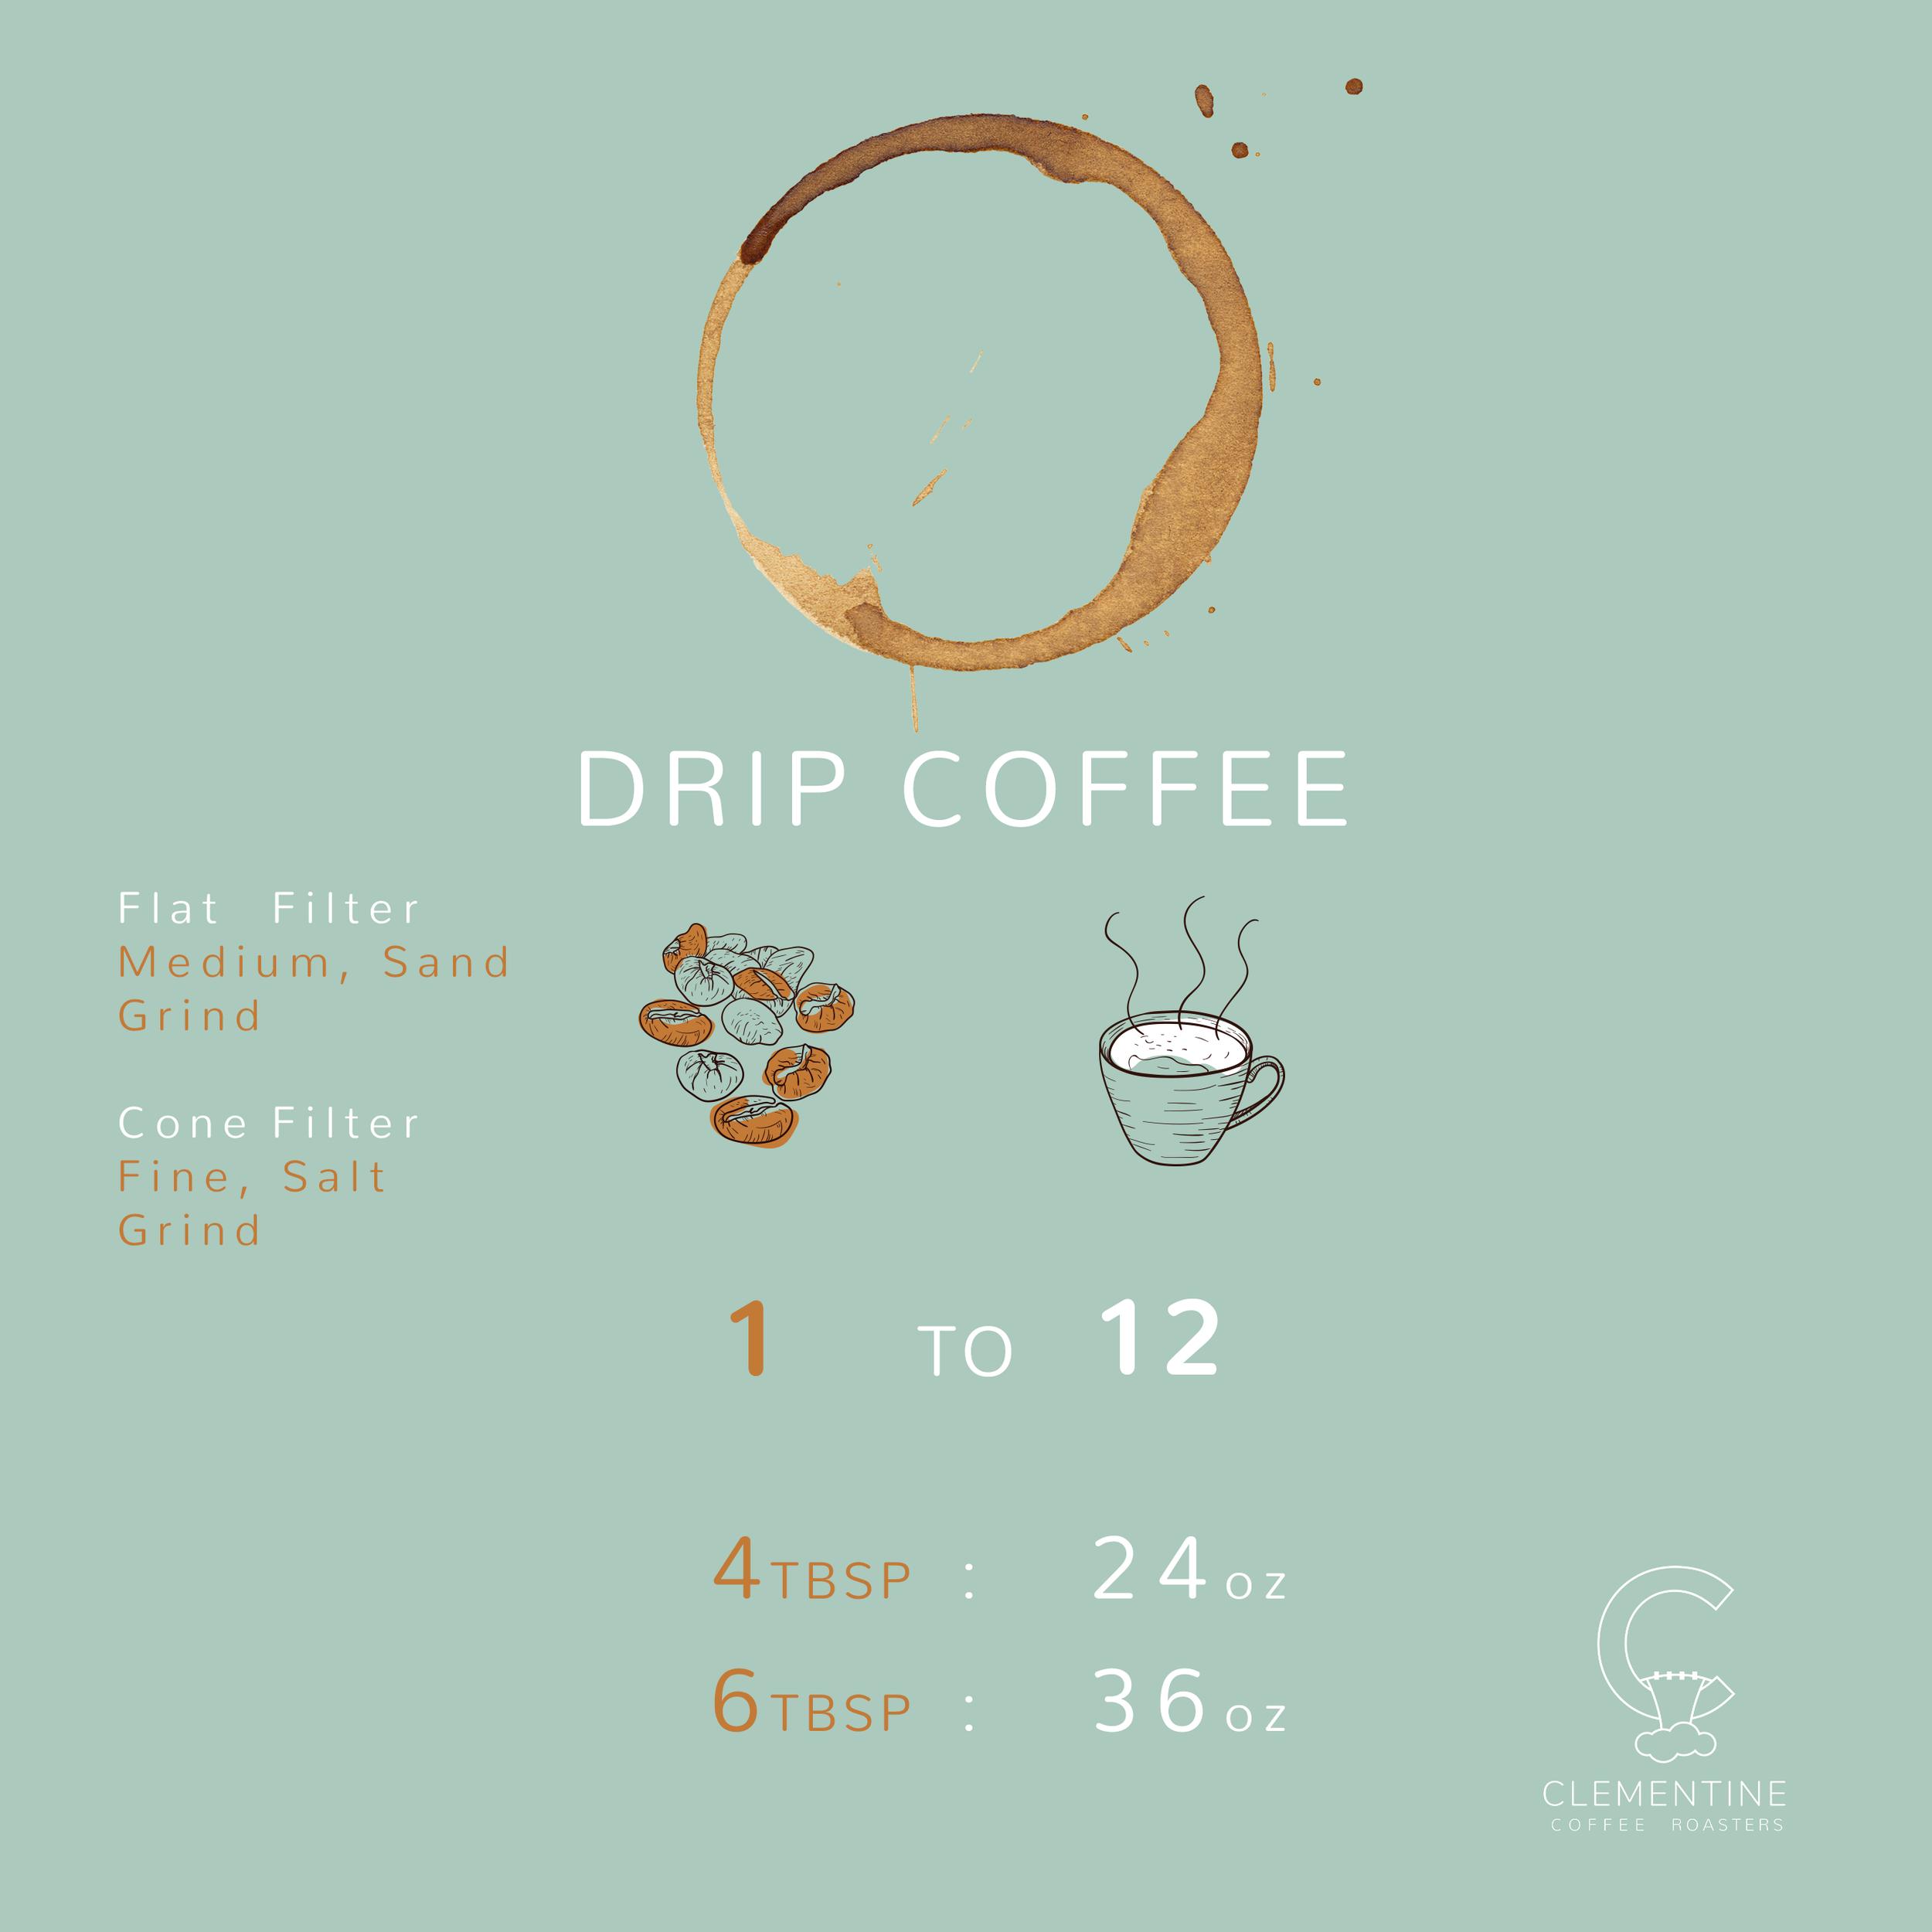 DripCoffee_BrewMethod_Graphic.png